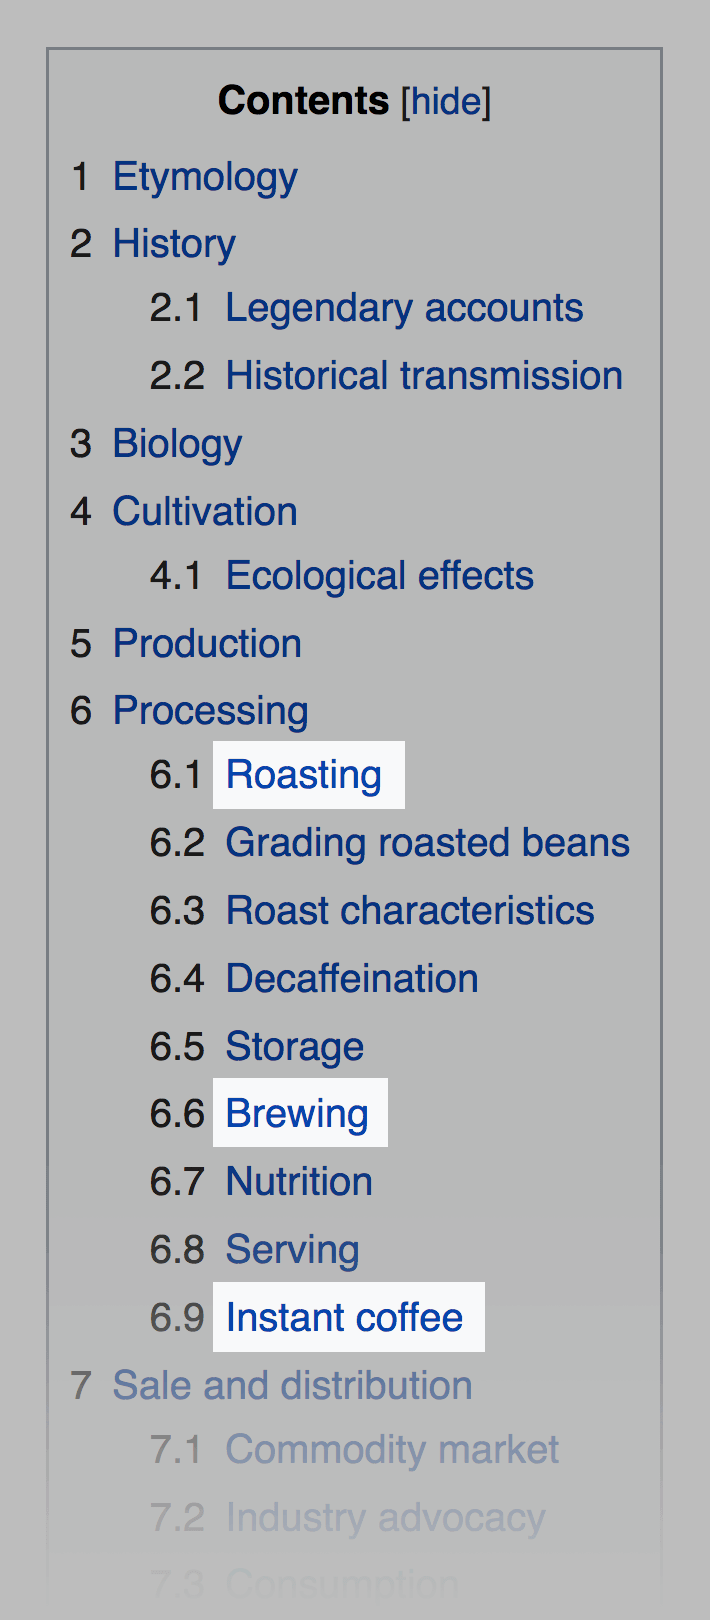 Wikipedia – Contents keywords